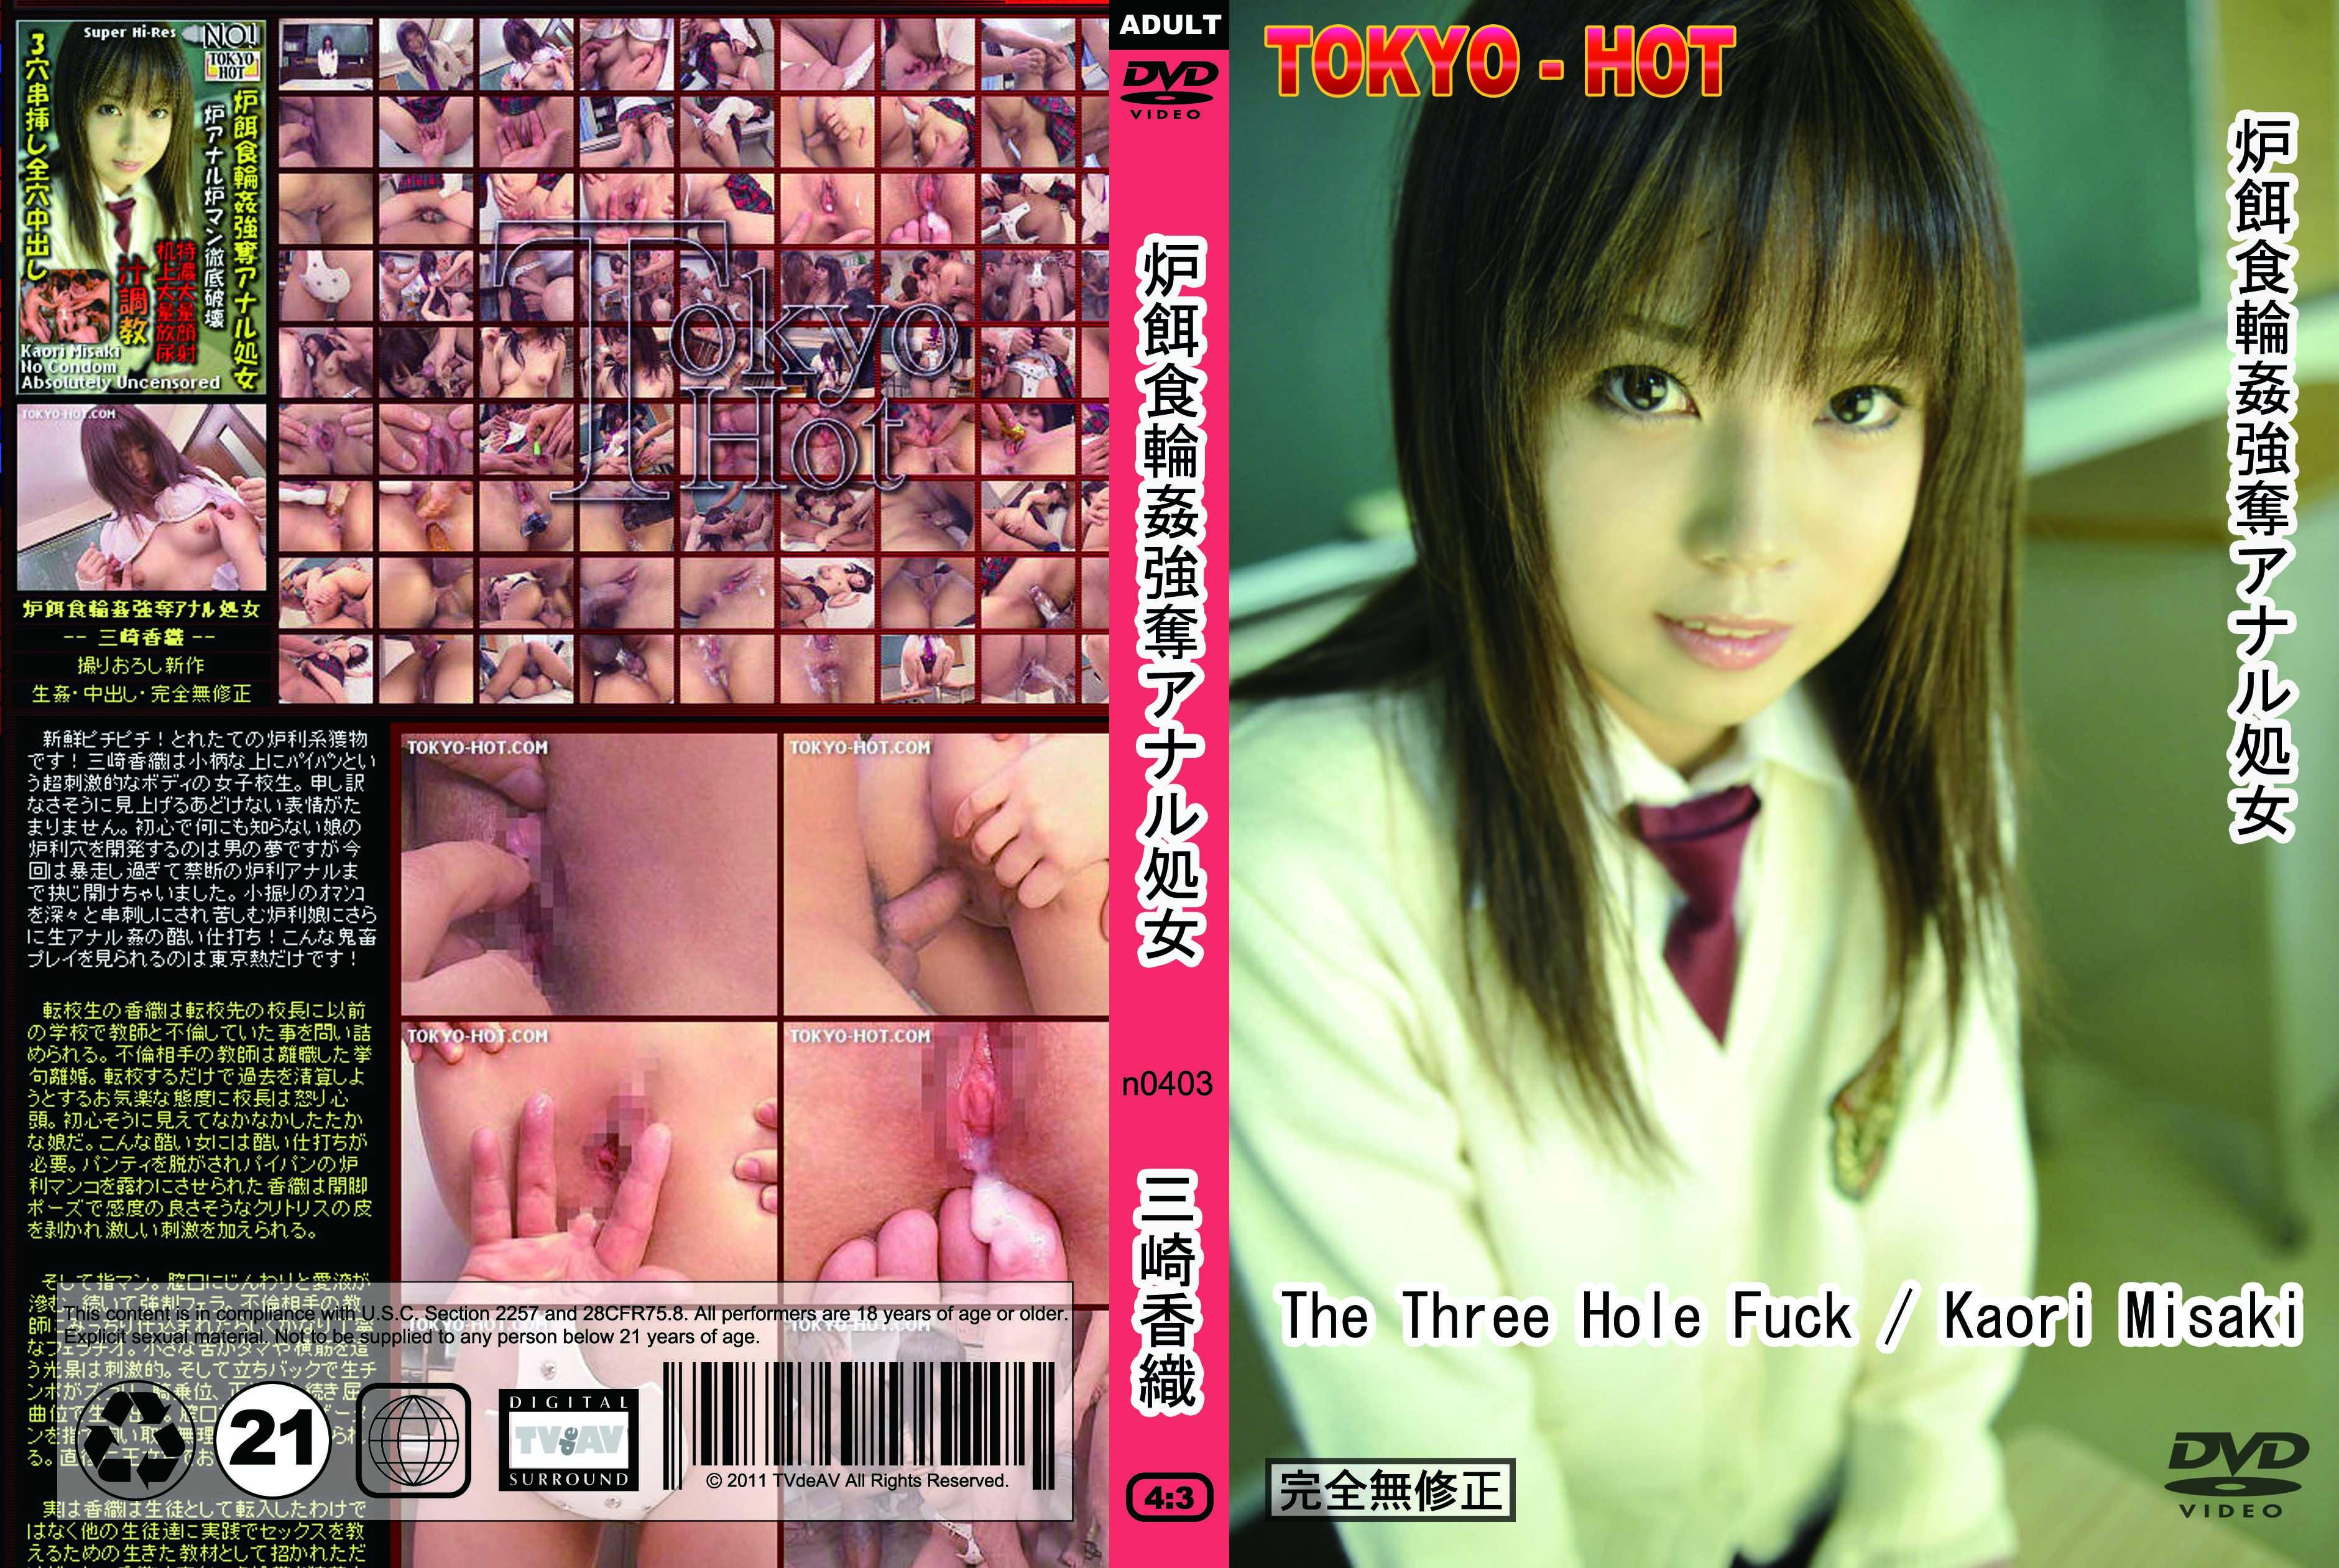 tokyo-hot-n0403-cd1-爐餌食輪奸強奪アナル処女三崎香織